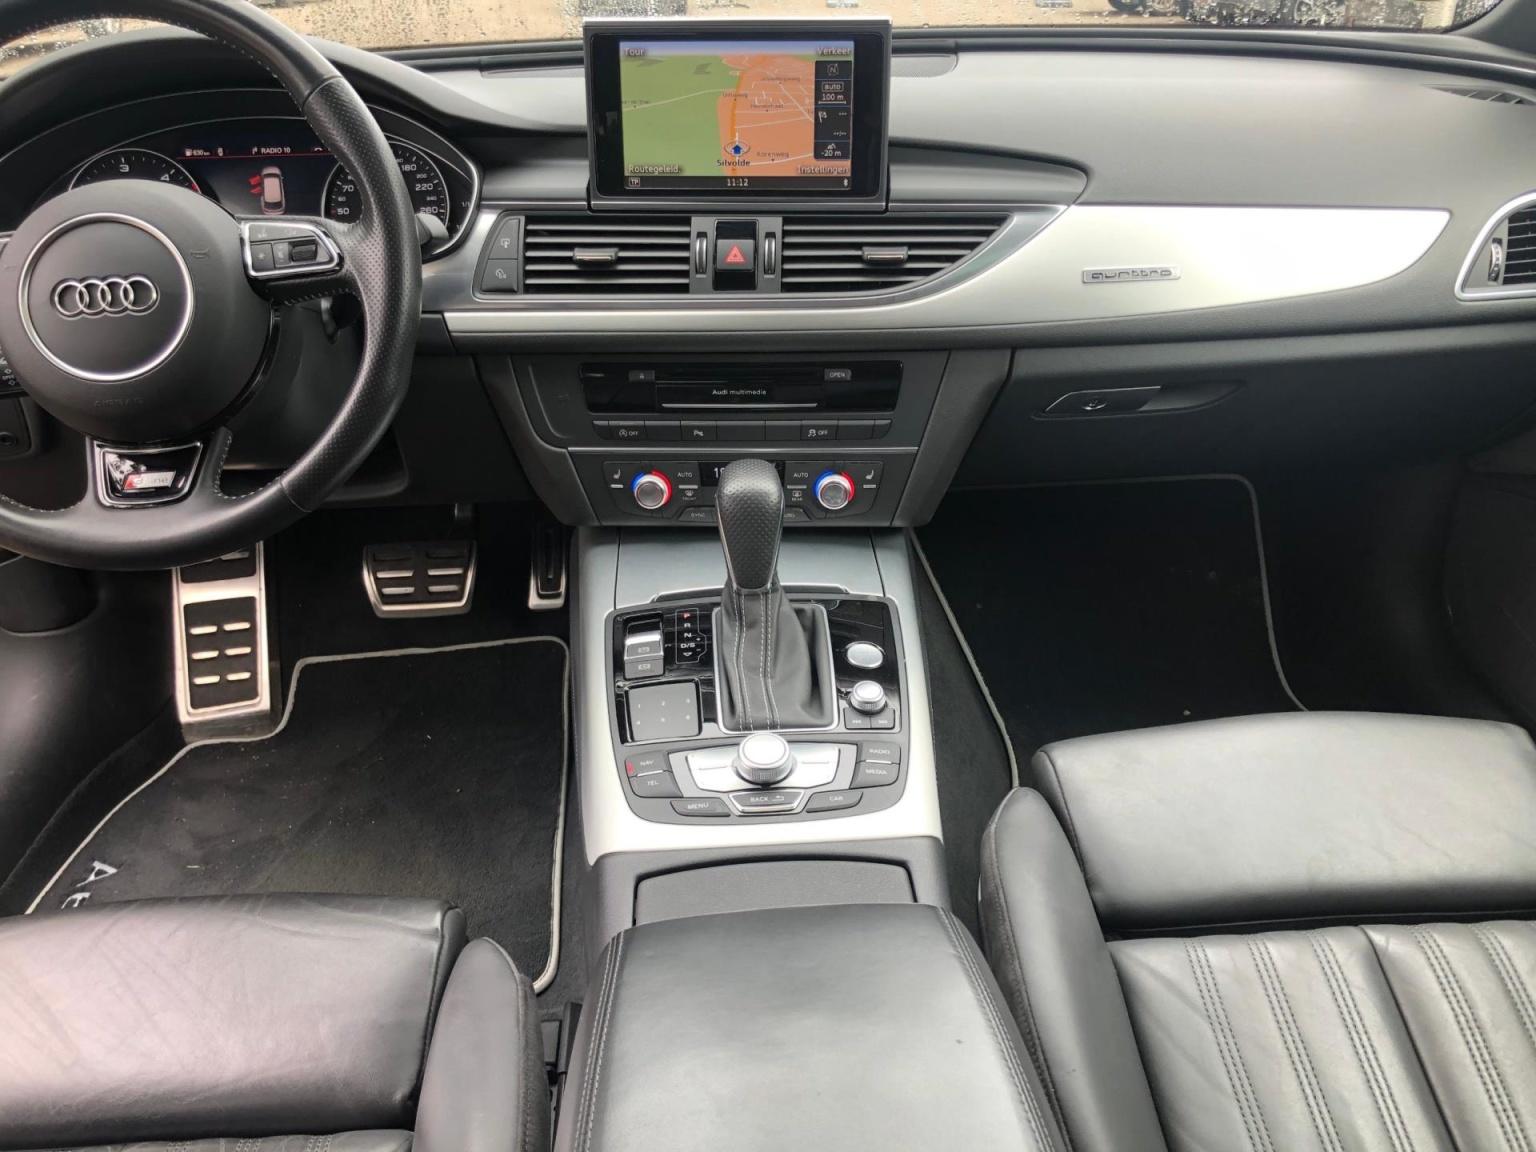 Audi-A6-19